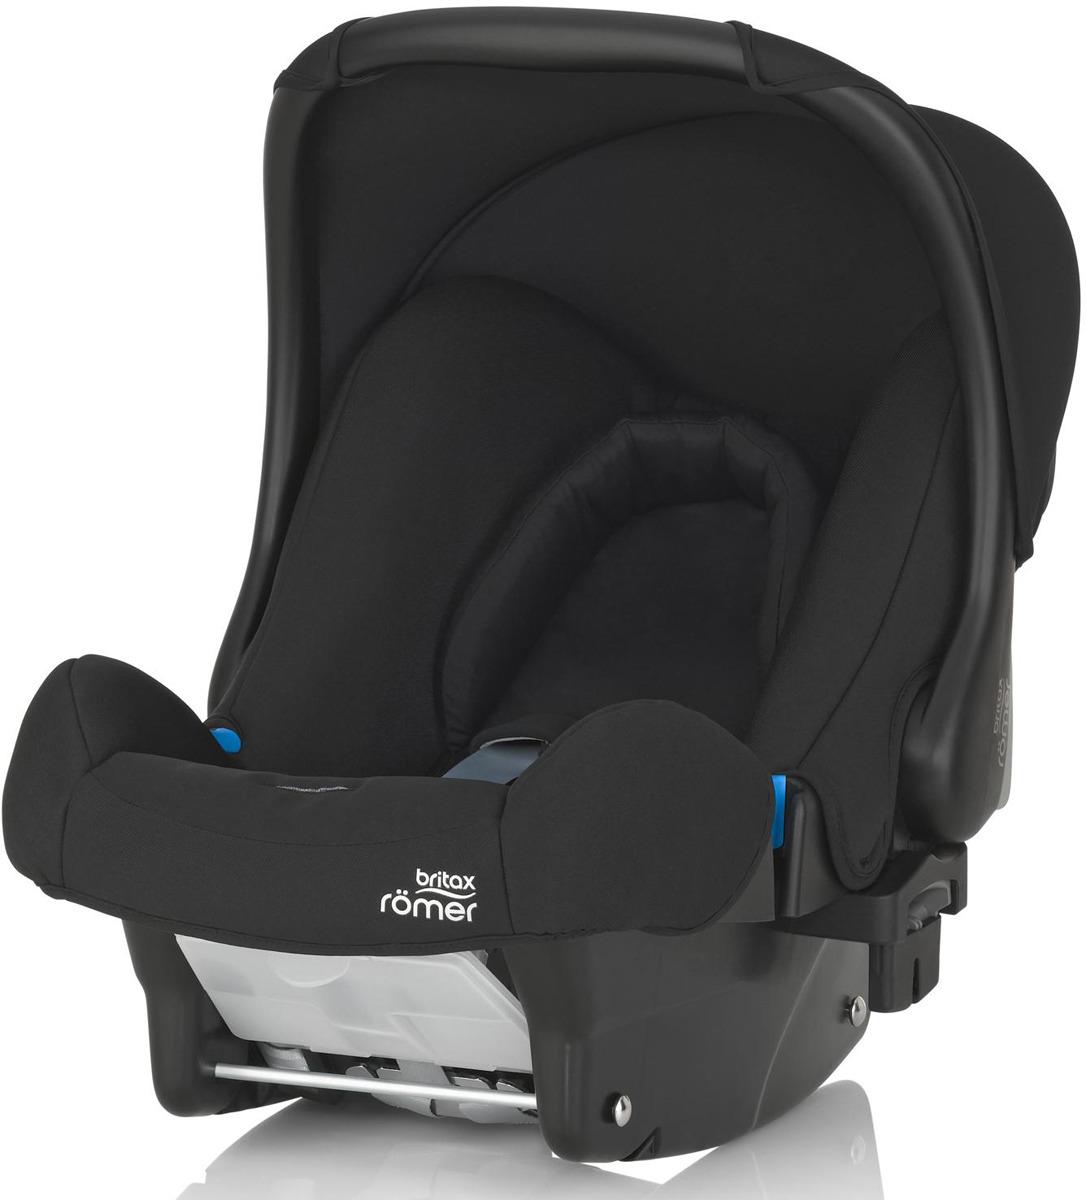 Фото - Автокресло Britax Roemer Baby-Safe Cosmos Black Trendline до 13 кг, 2000026517 автокресло britax roemer baby safe cosmos black trendline 2000026517